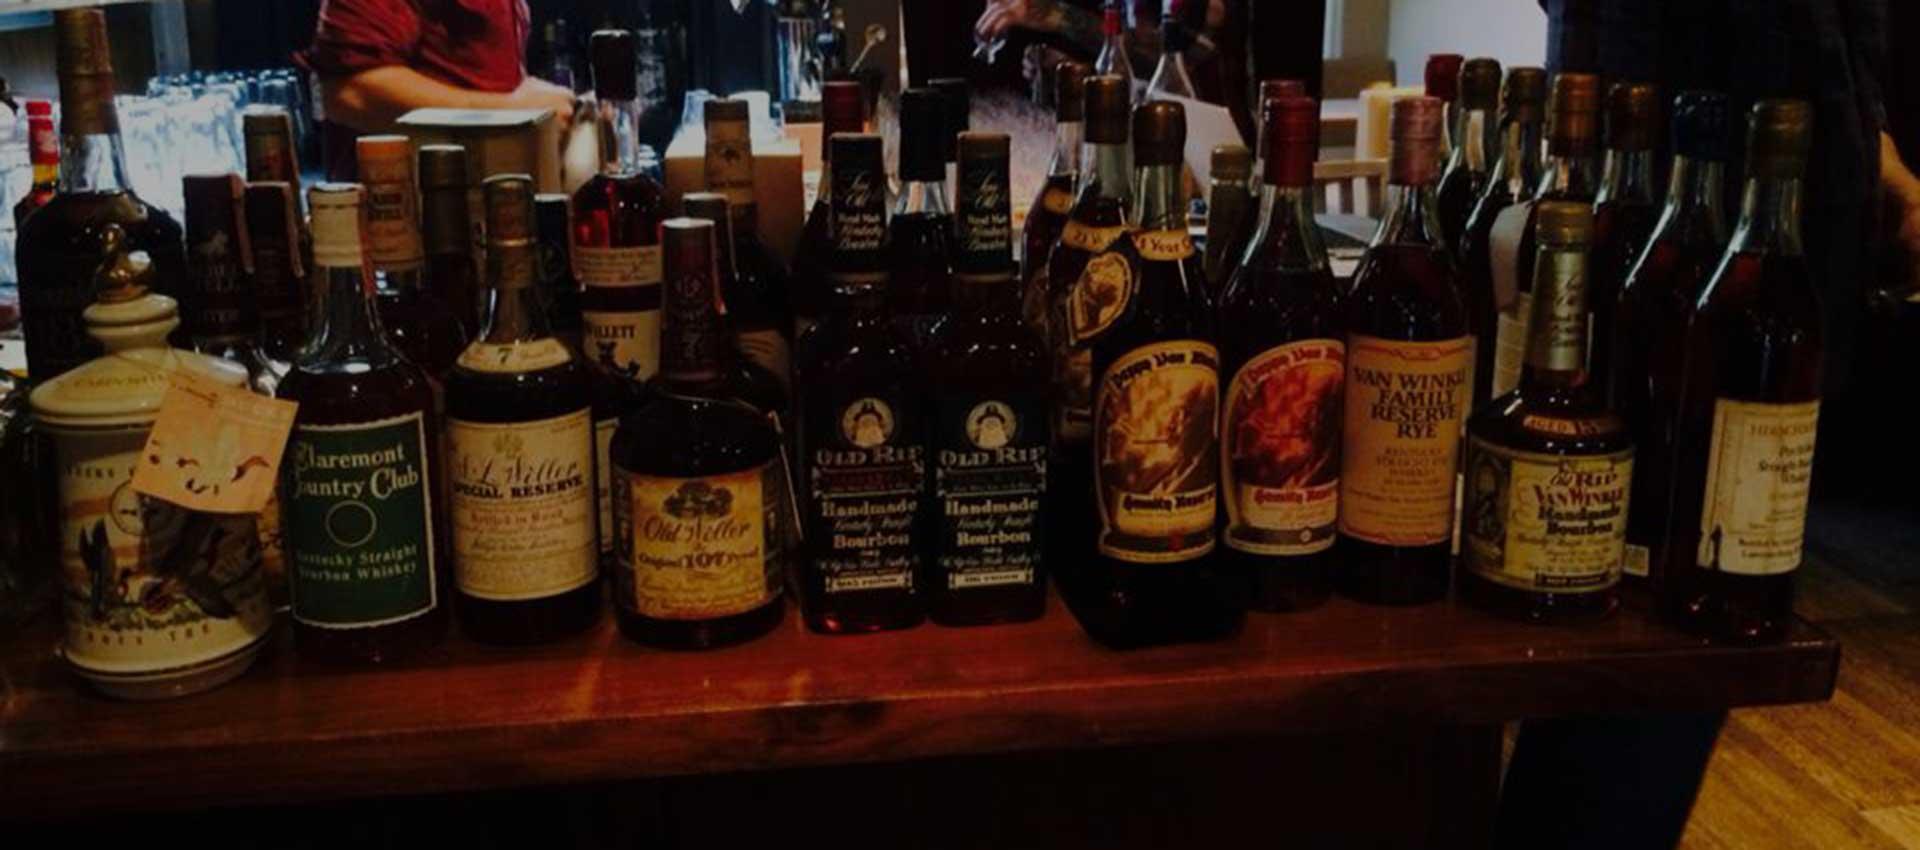 the bourbon source